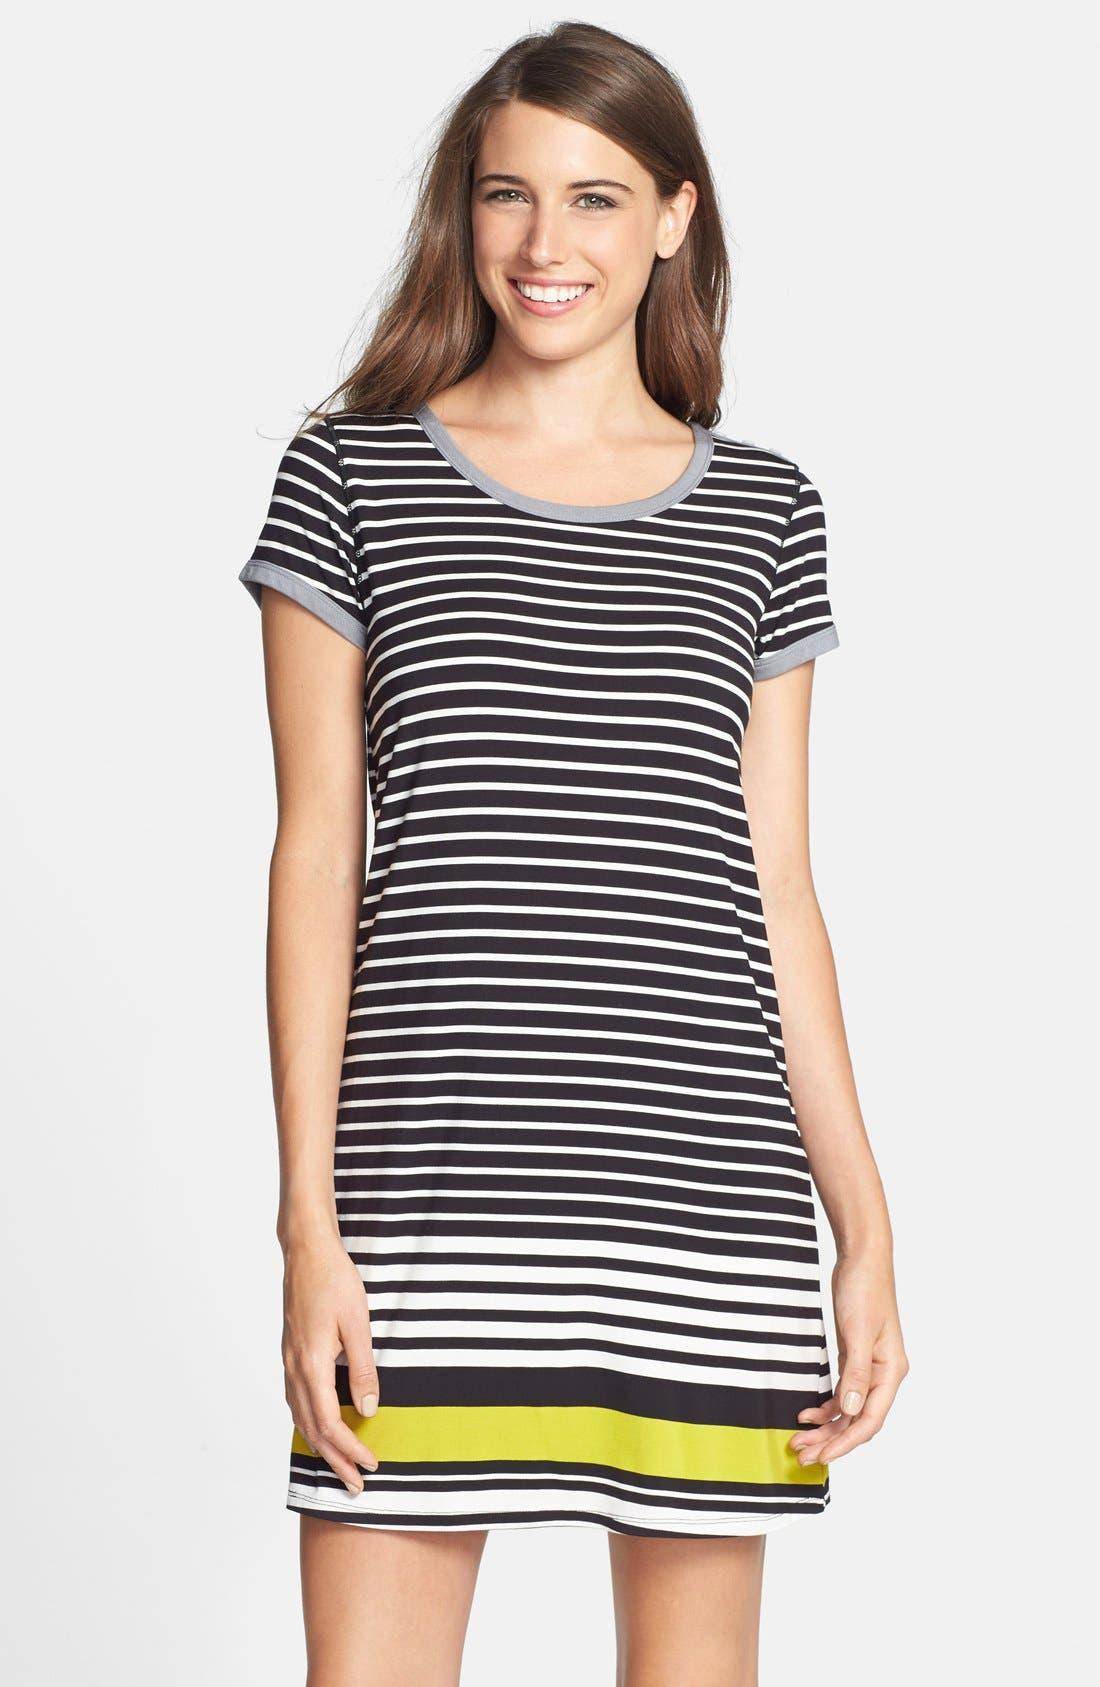 Alternate Image 1 Selected - DKNY 'Graphic Avenue' Print Jersey Sleep Shirt